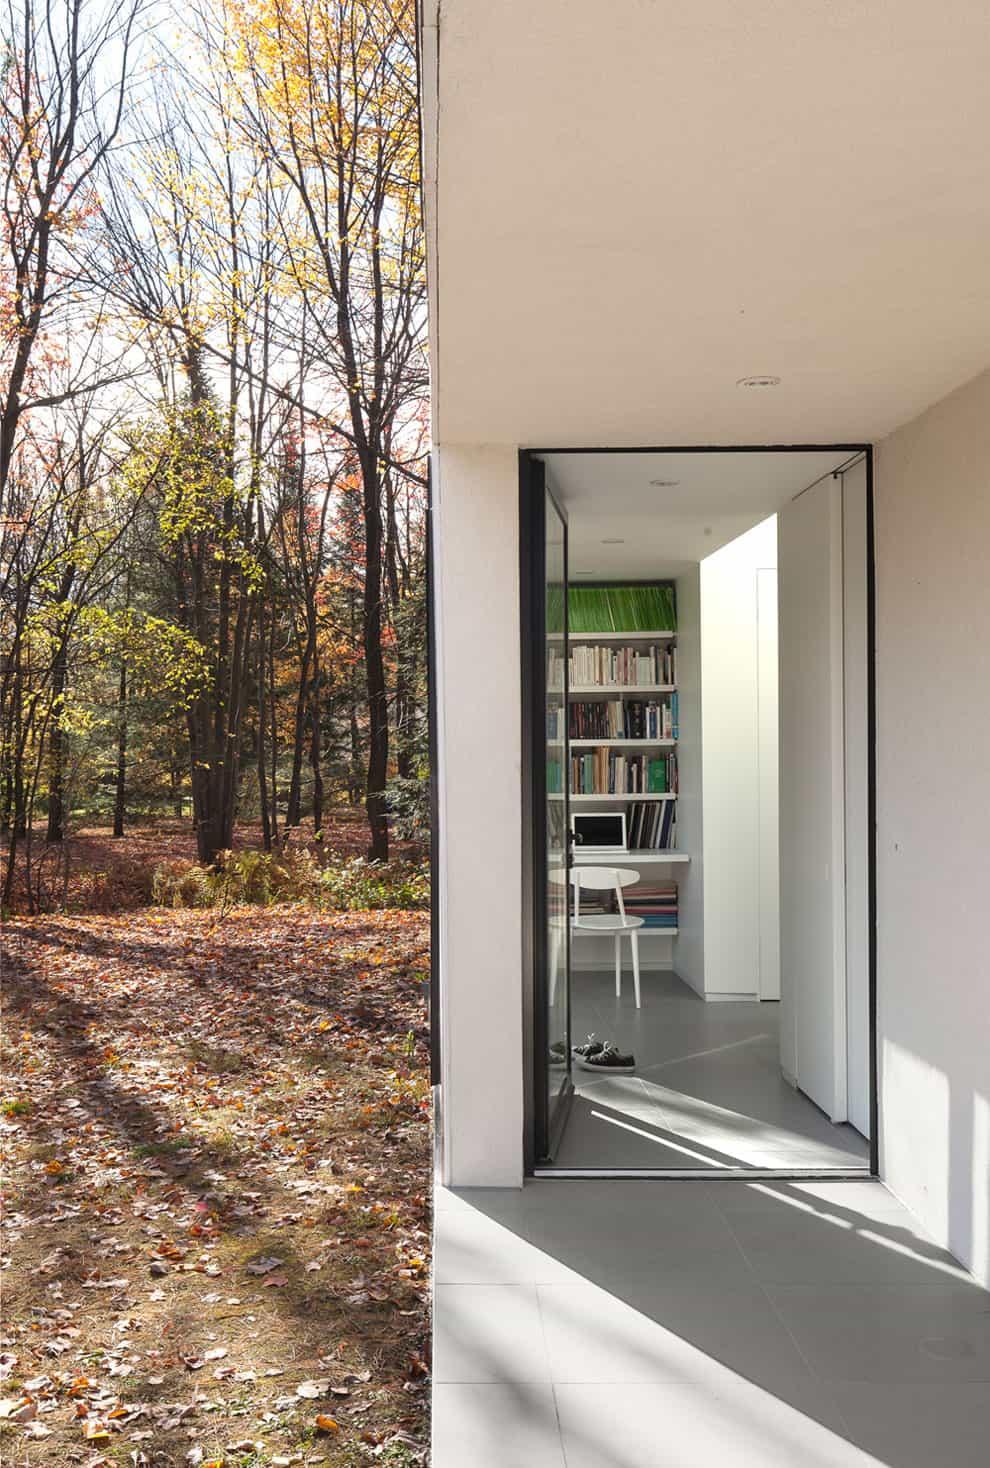 Terrebonne by La SHED Architecture (2)